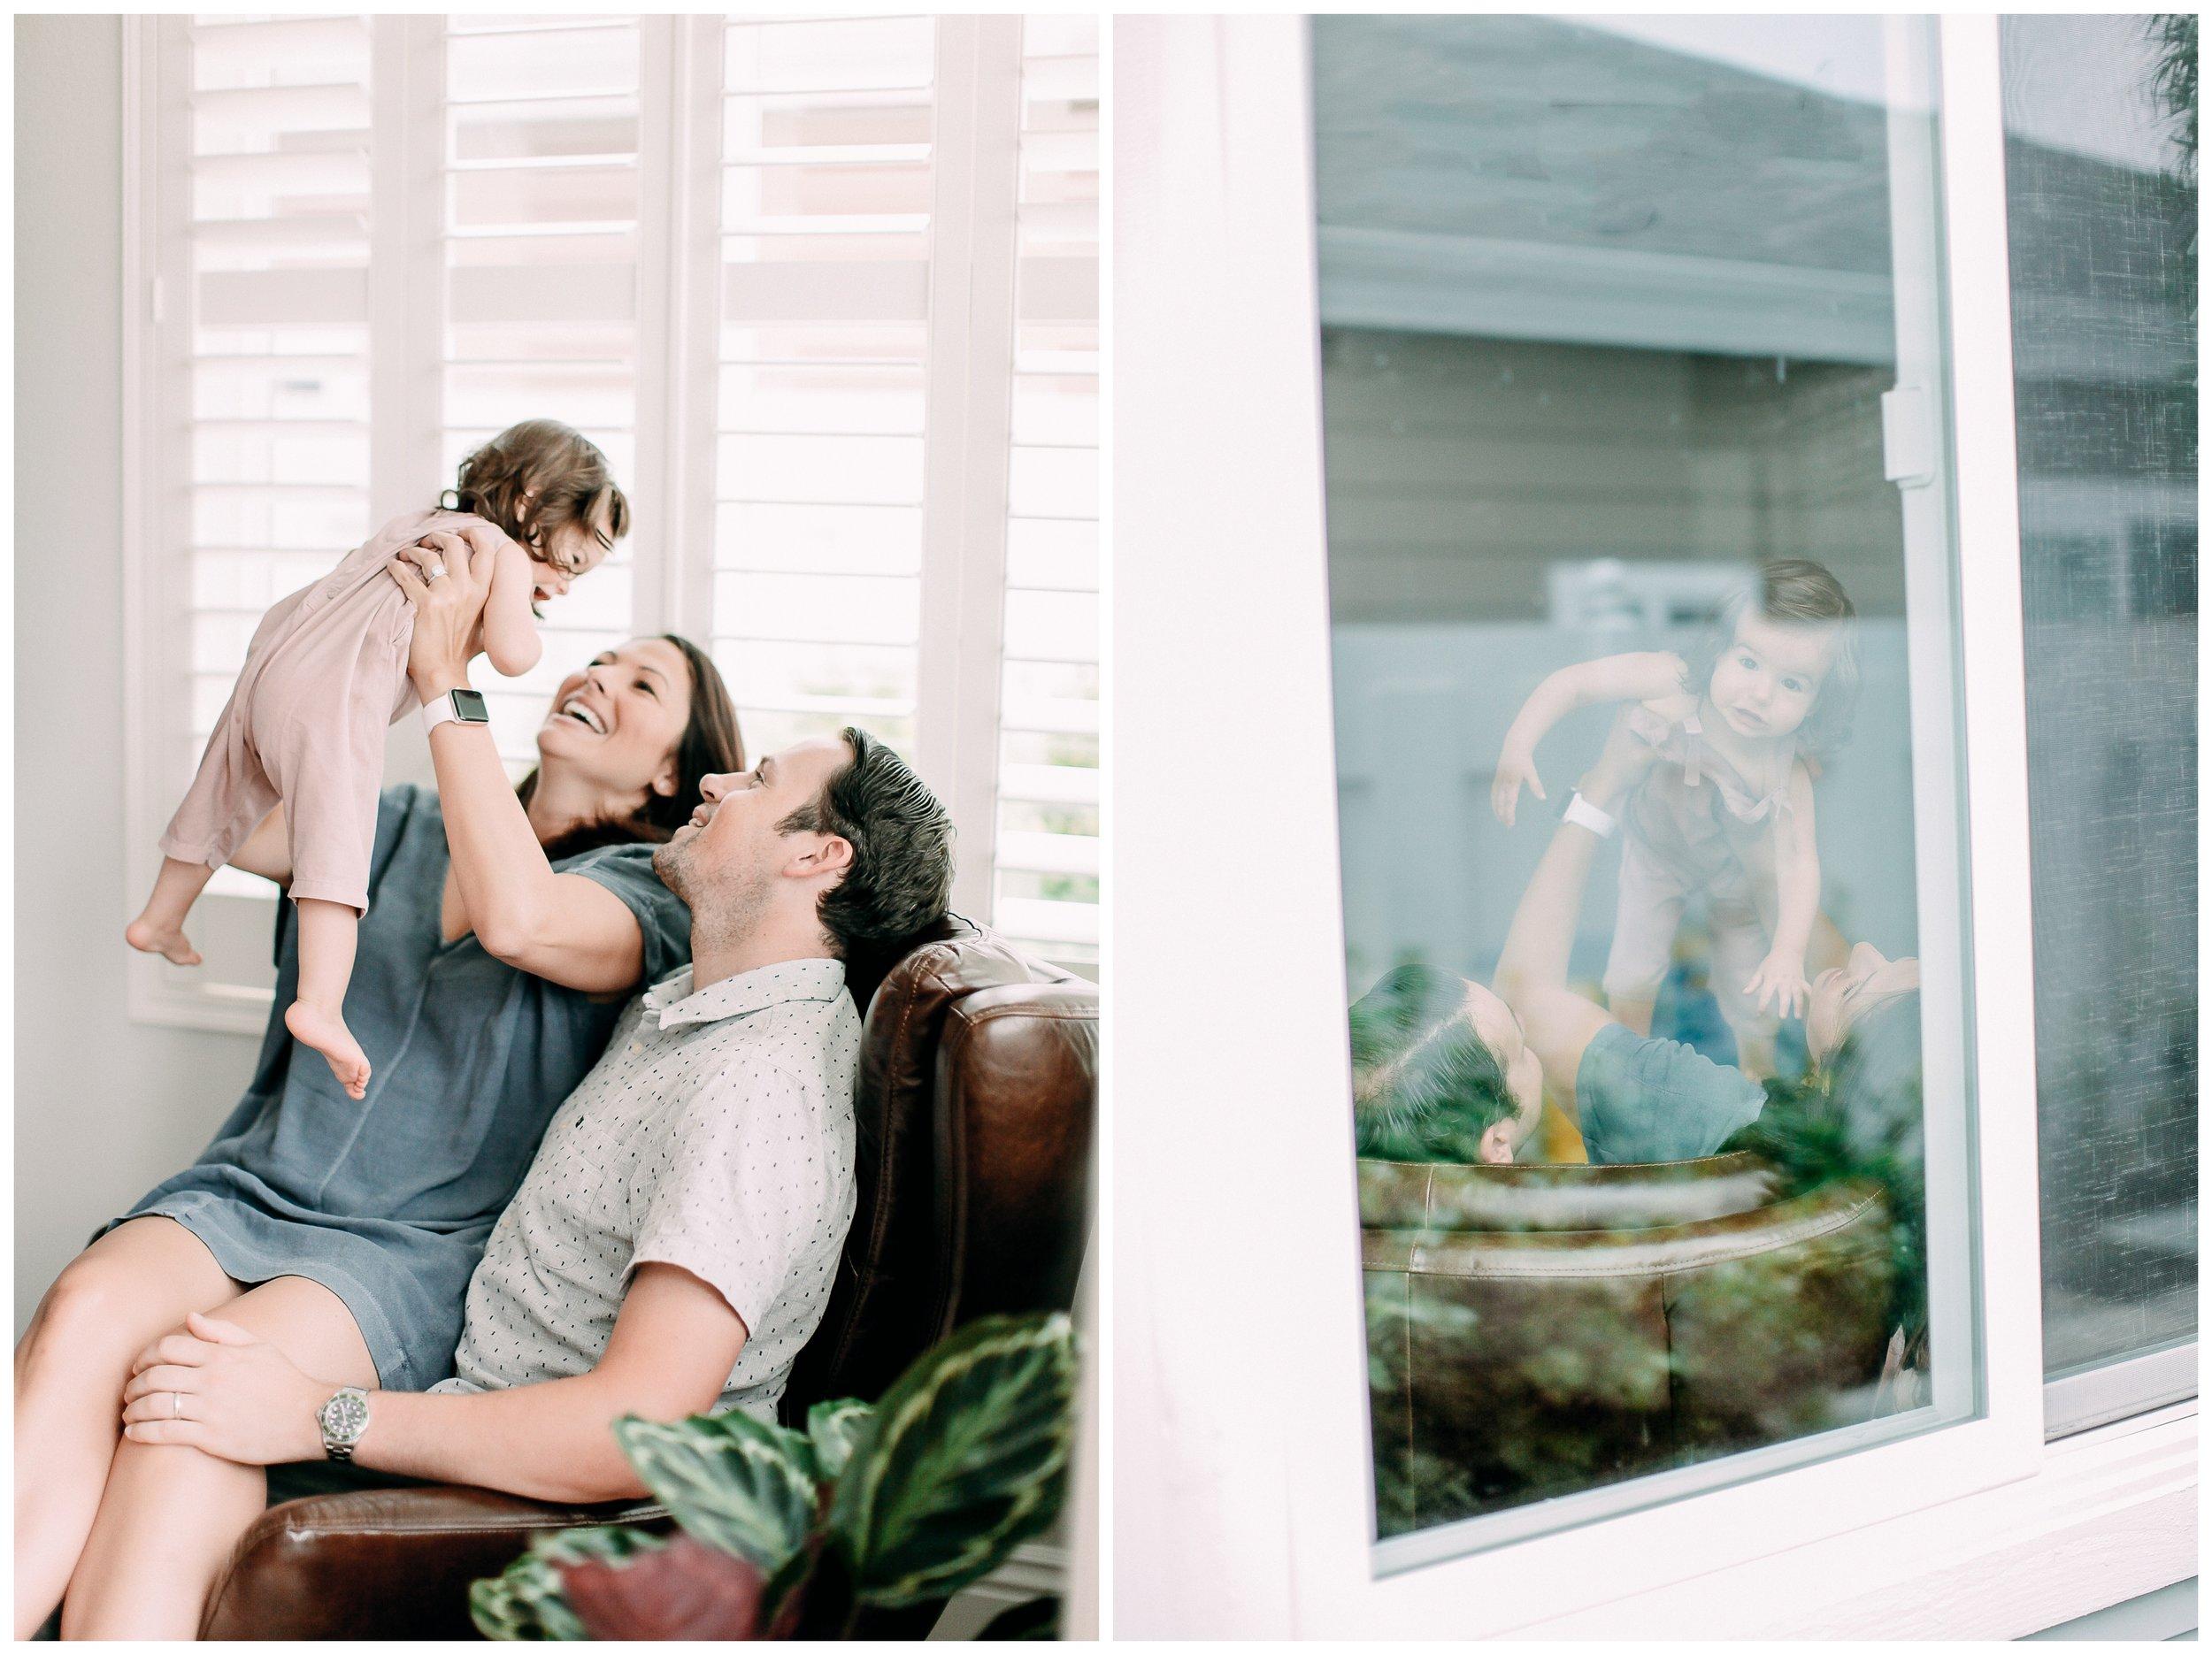 Orange_county_family_photographer_cori_kleckner_photography_0423.jpg